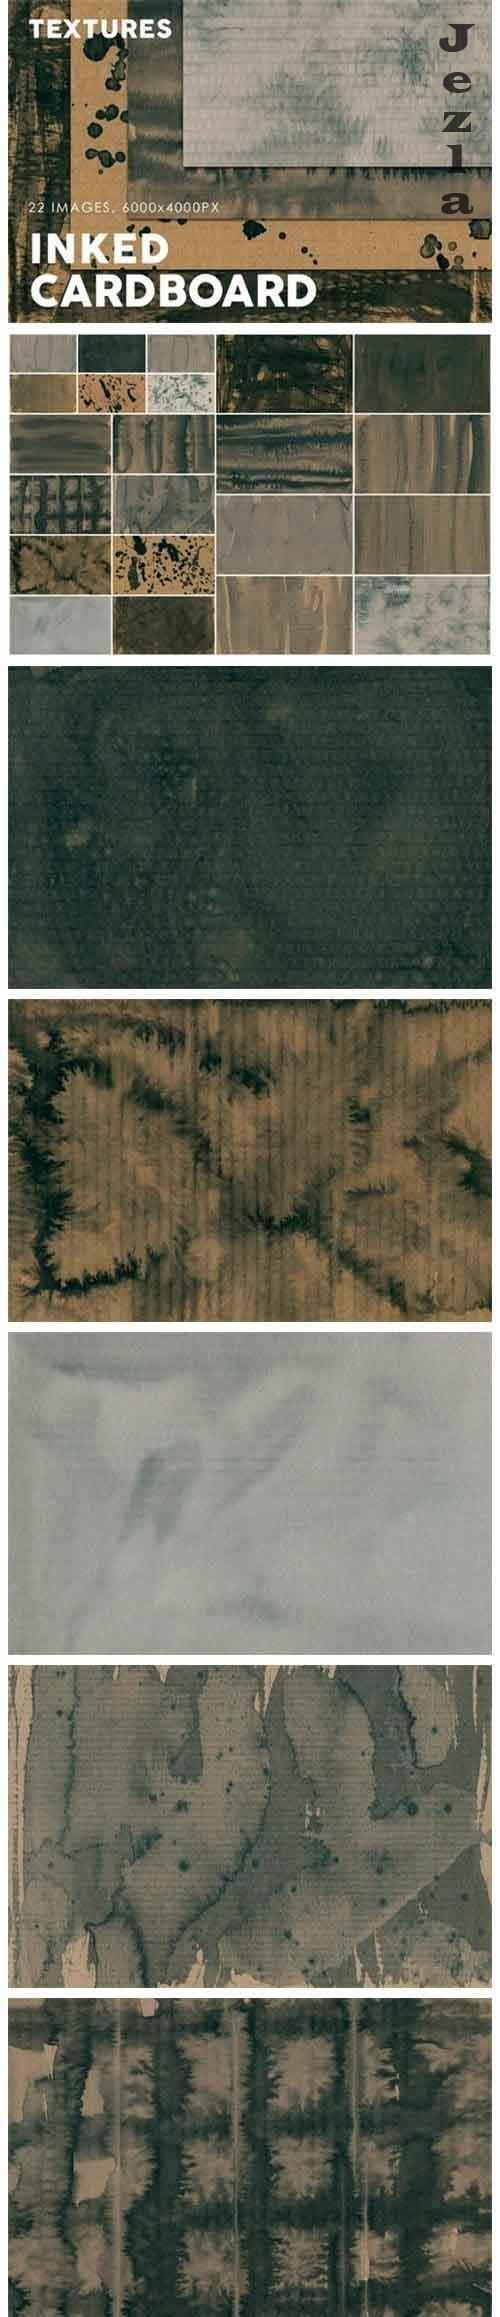 Inked Cardboard Textures  - 728408